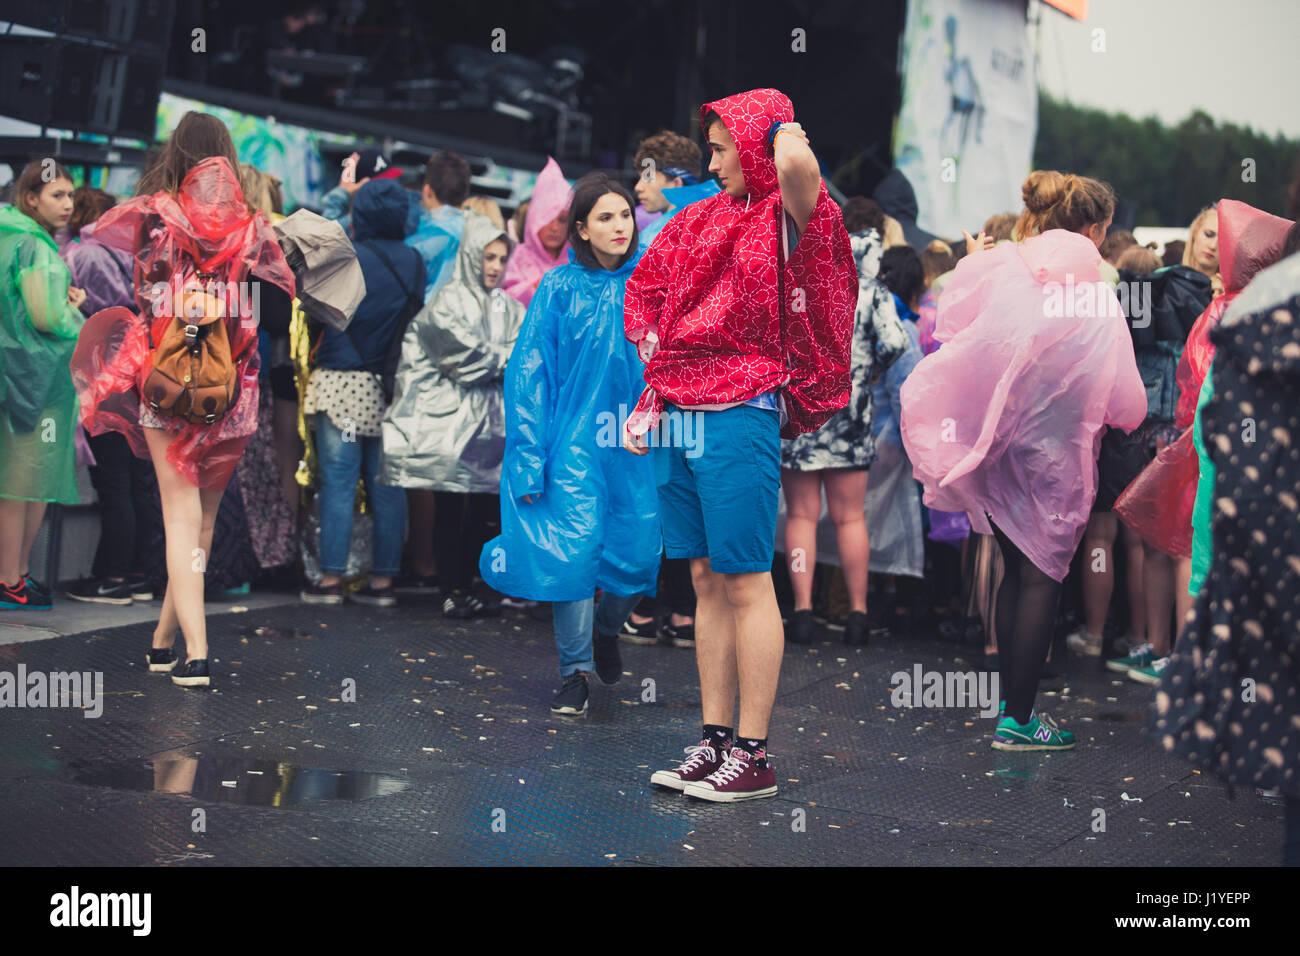 Festival-goers in plastic ponchos in rain at Open'er Festival in Poland. - Stock Image